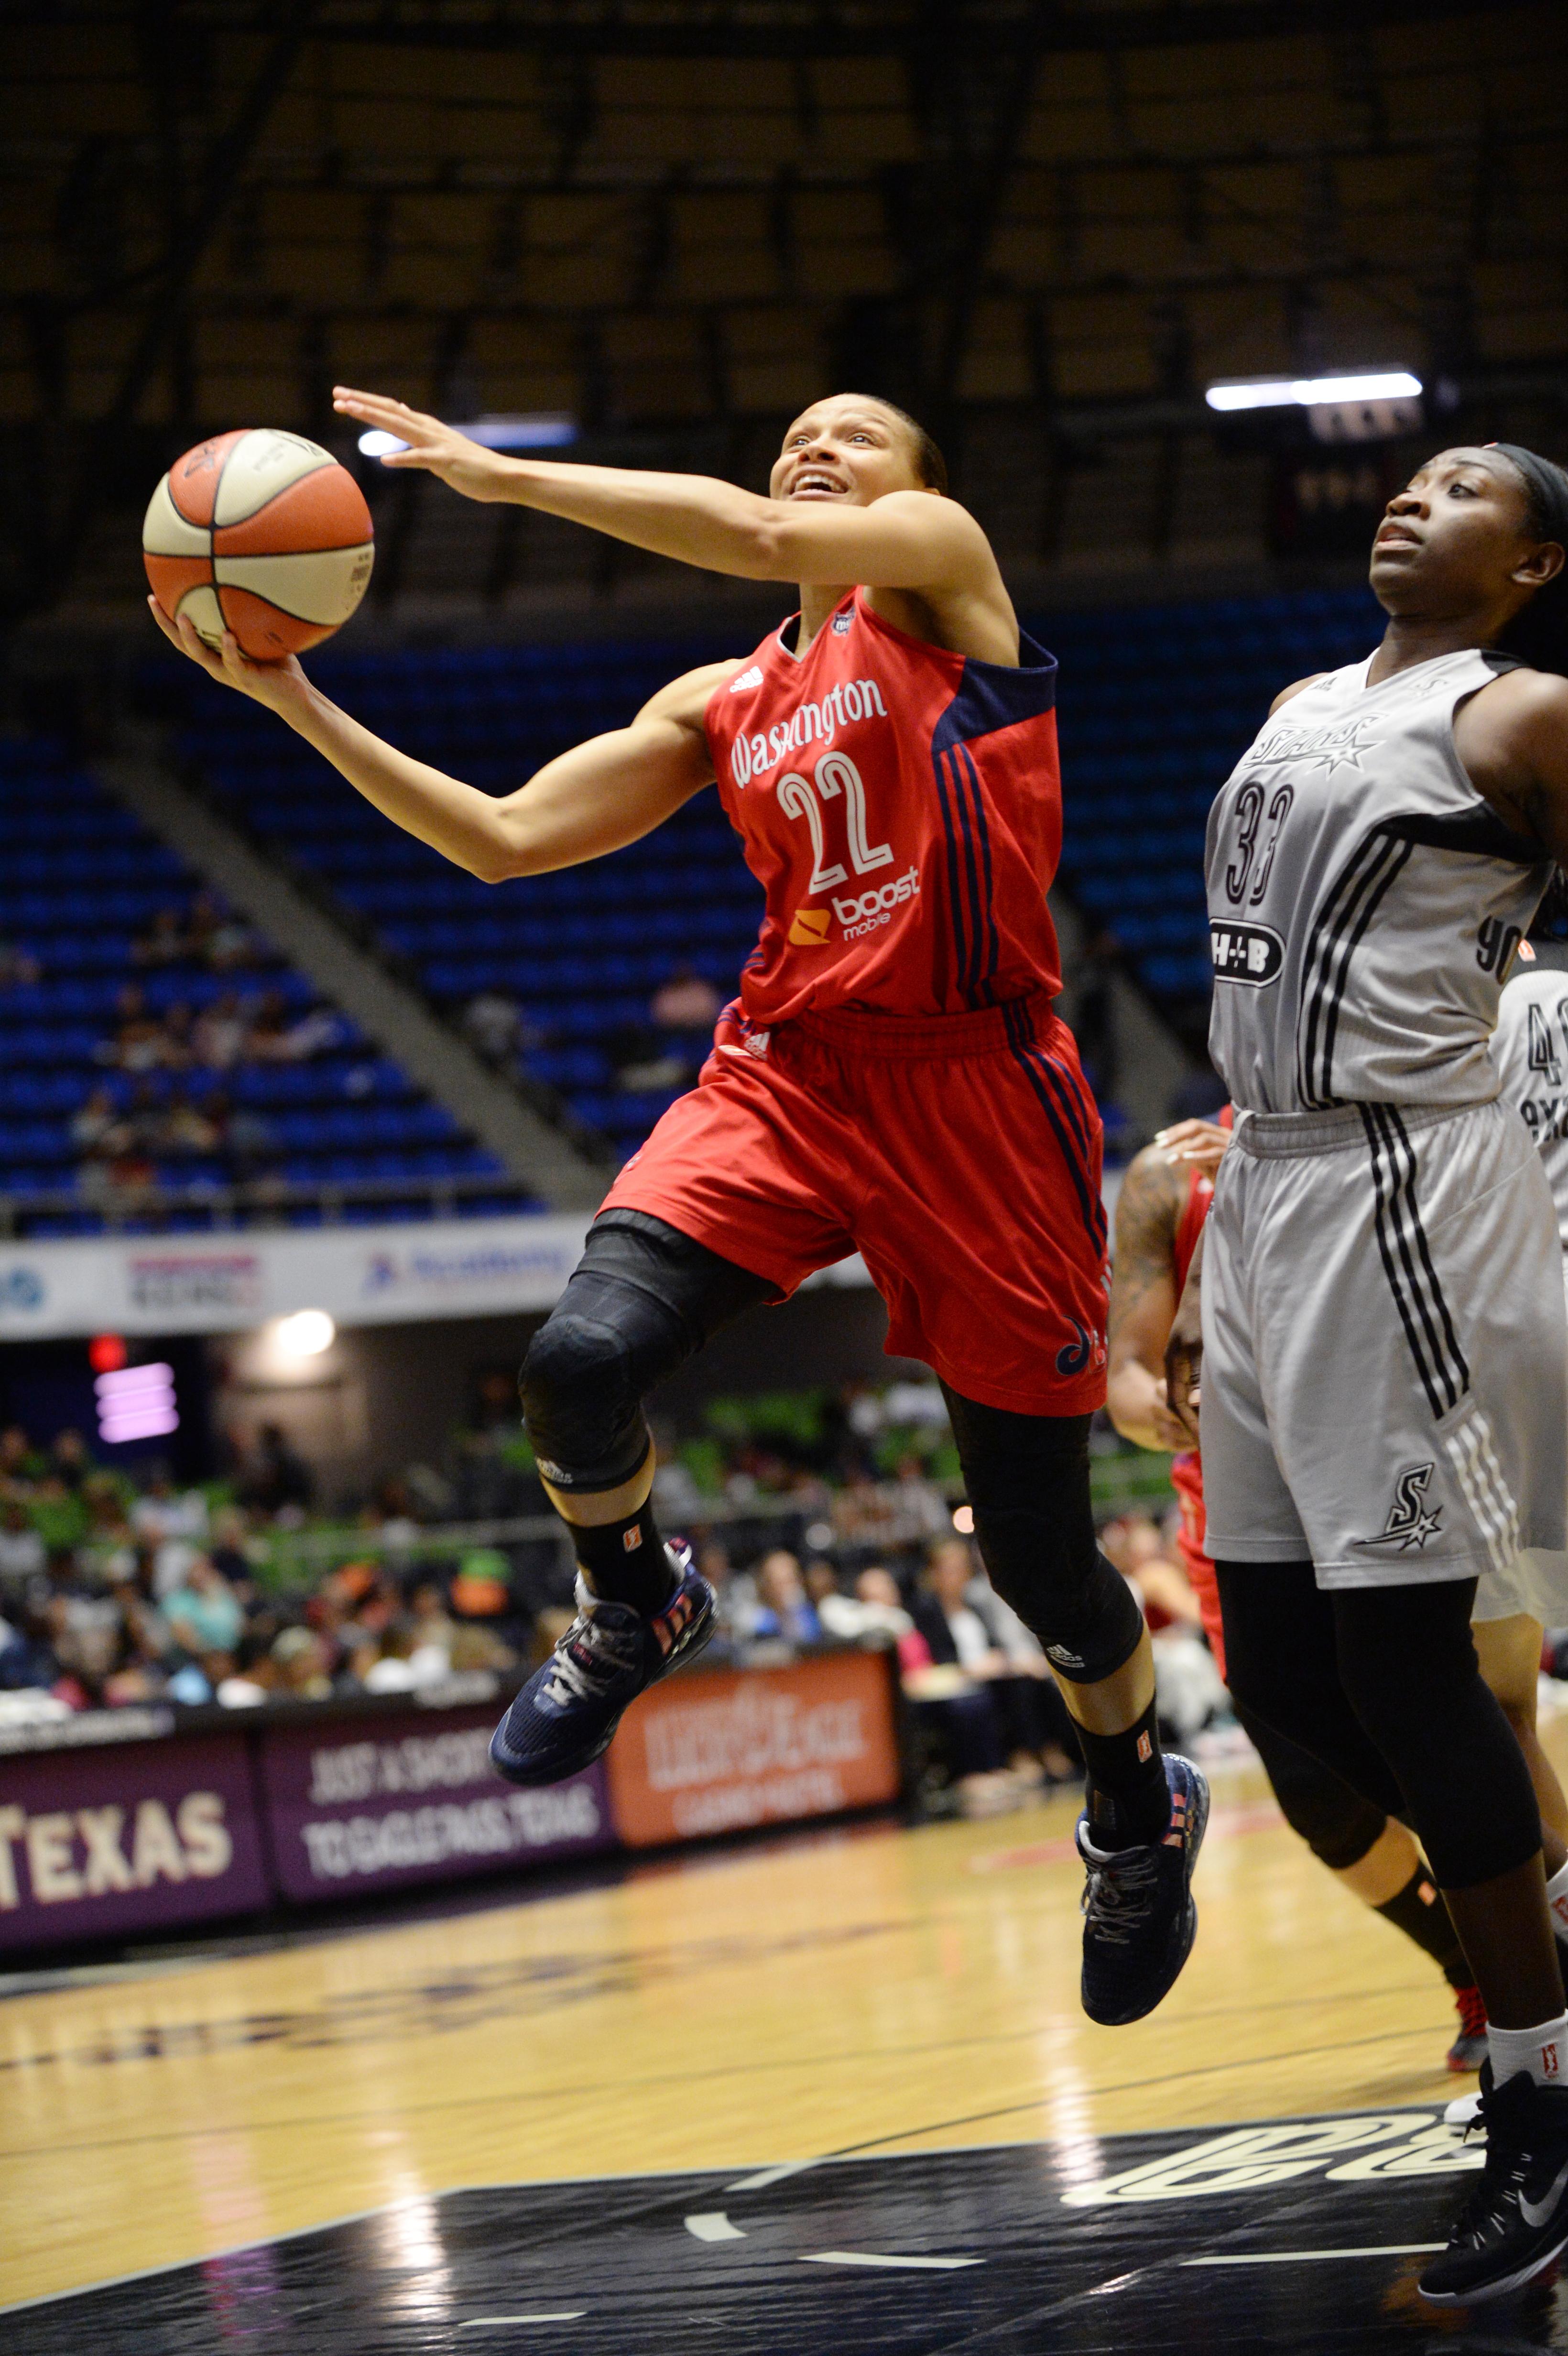 SAN ANTONIO - JULY 31: Armintie Herrington #22 of the Washington Mystics shoots the ball against the San Antonio Stars in the WNBA game on July 31, 2015 at the Freeman Coliseum in San Antonio, Texas.